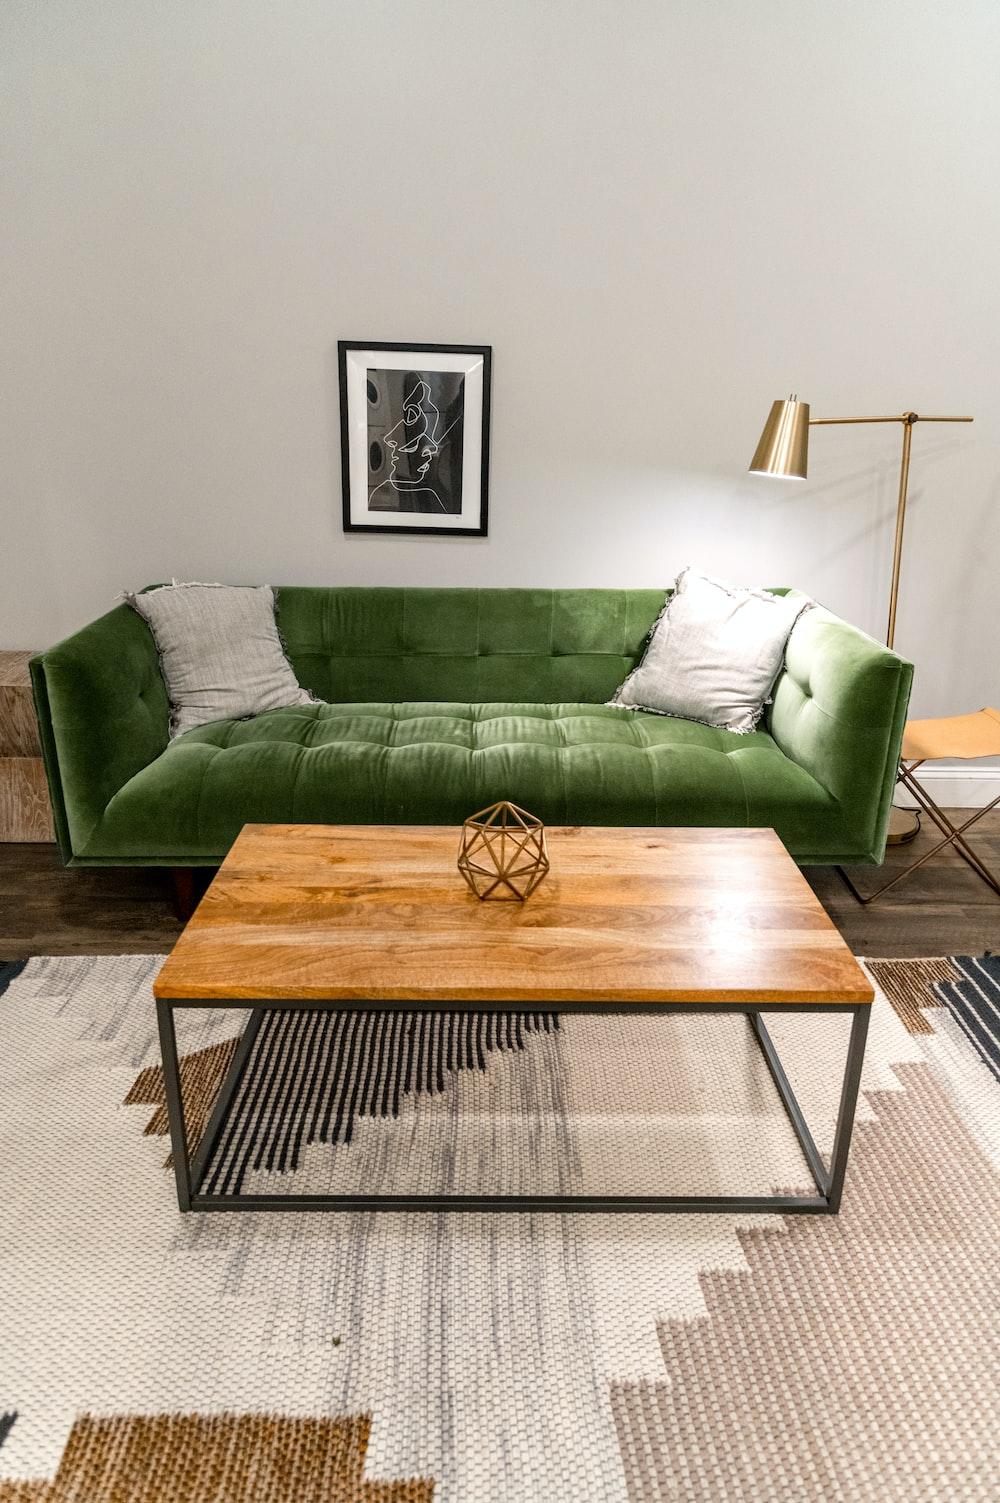 brown wooden table near green sofa